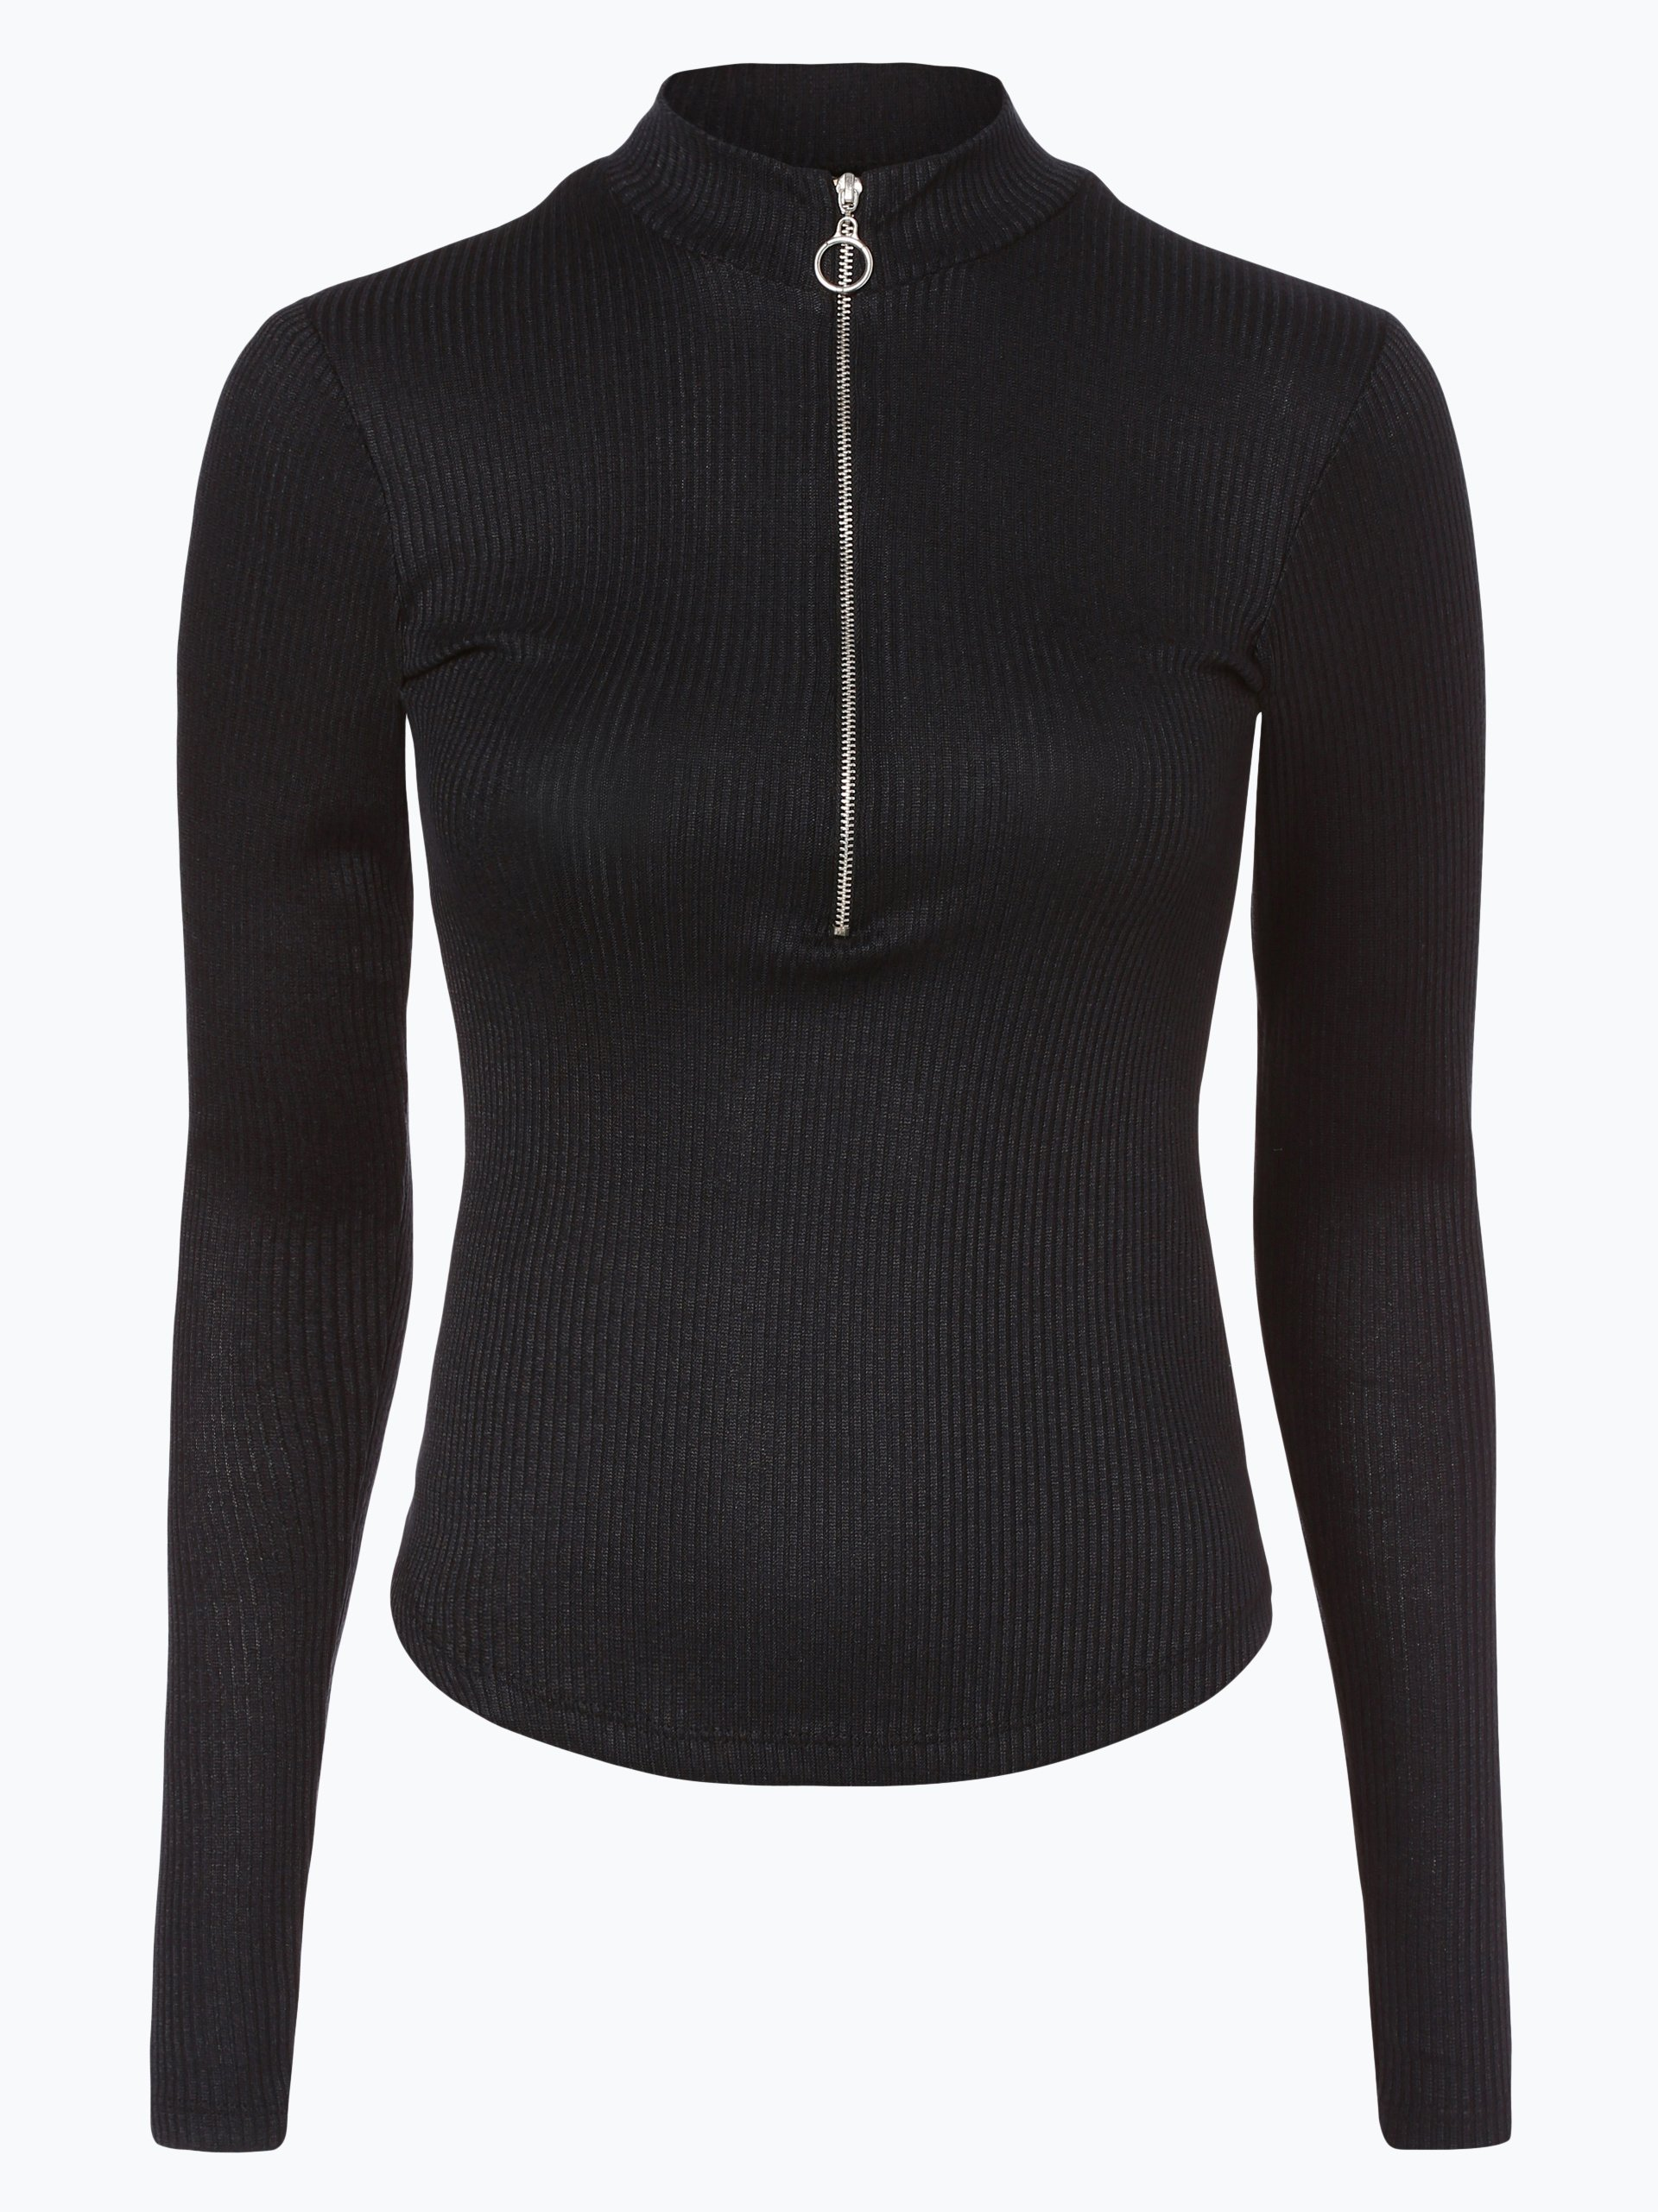 review damen langarmshirt schwarz uni online kaufen. Black Bedroom Furniture Sets. Home Design Ideas